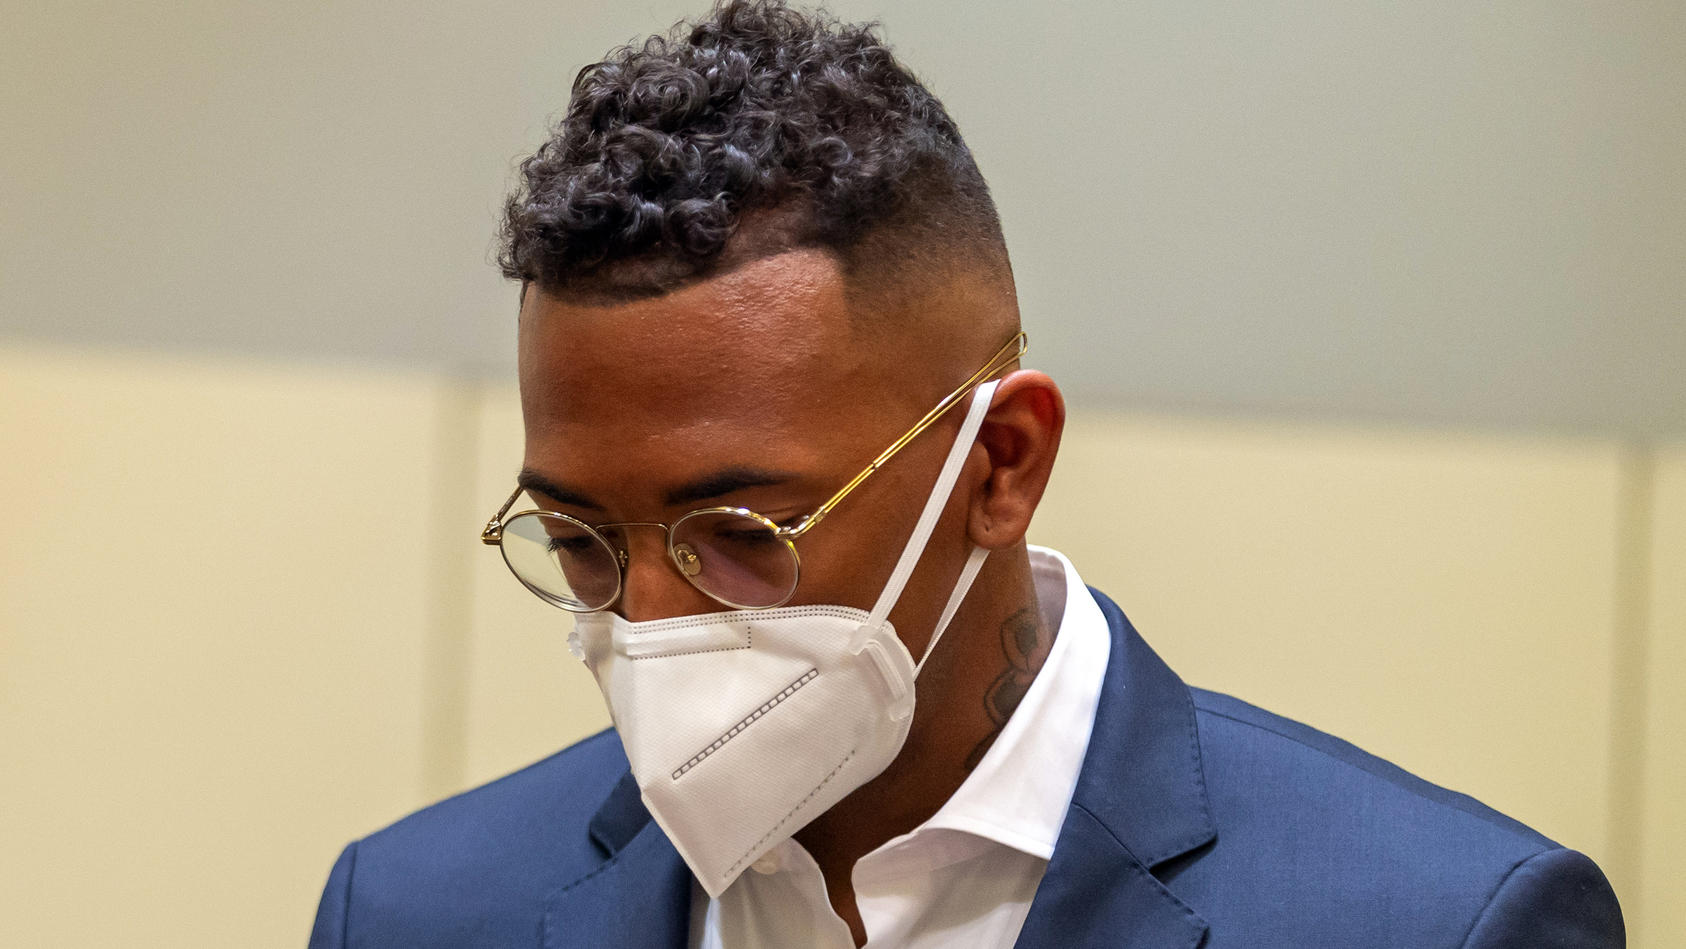 Boateng wegen Körperverletzung verurteilt - nun legt sein Anwalt Berufung ein